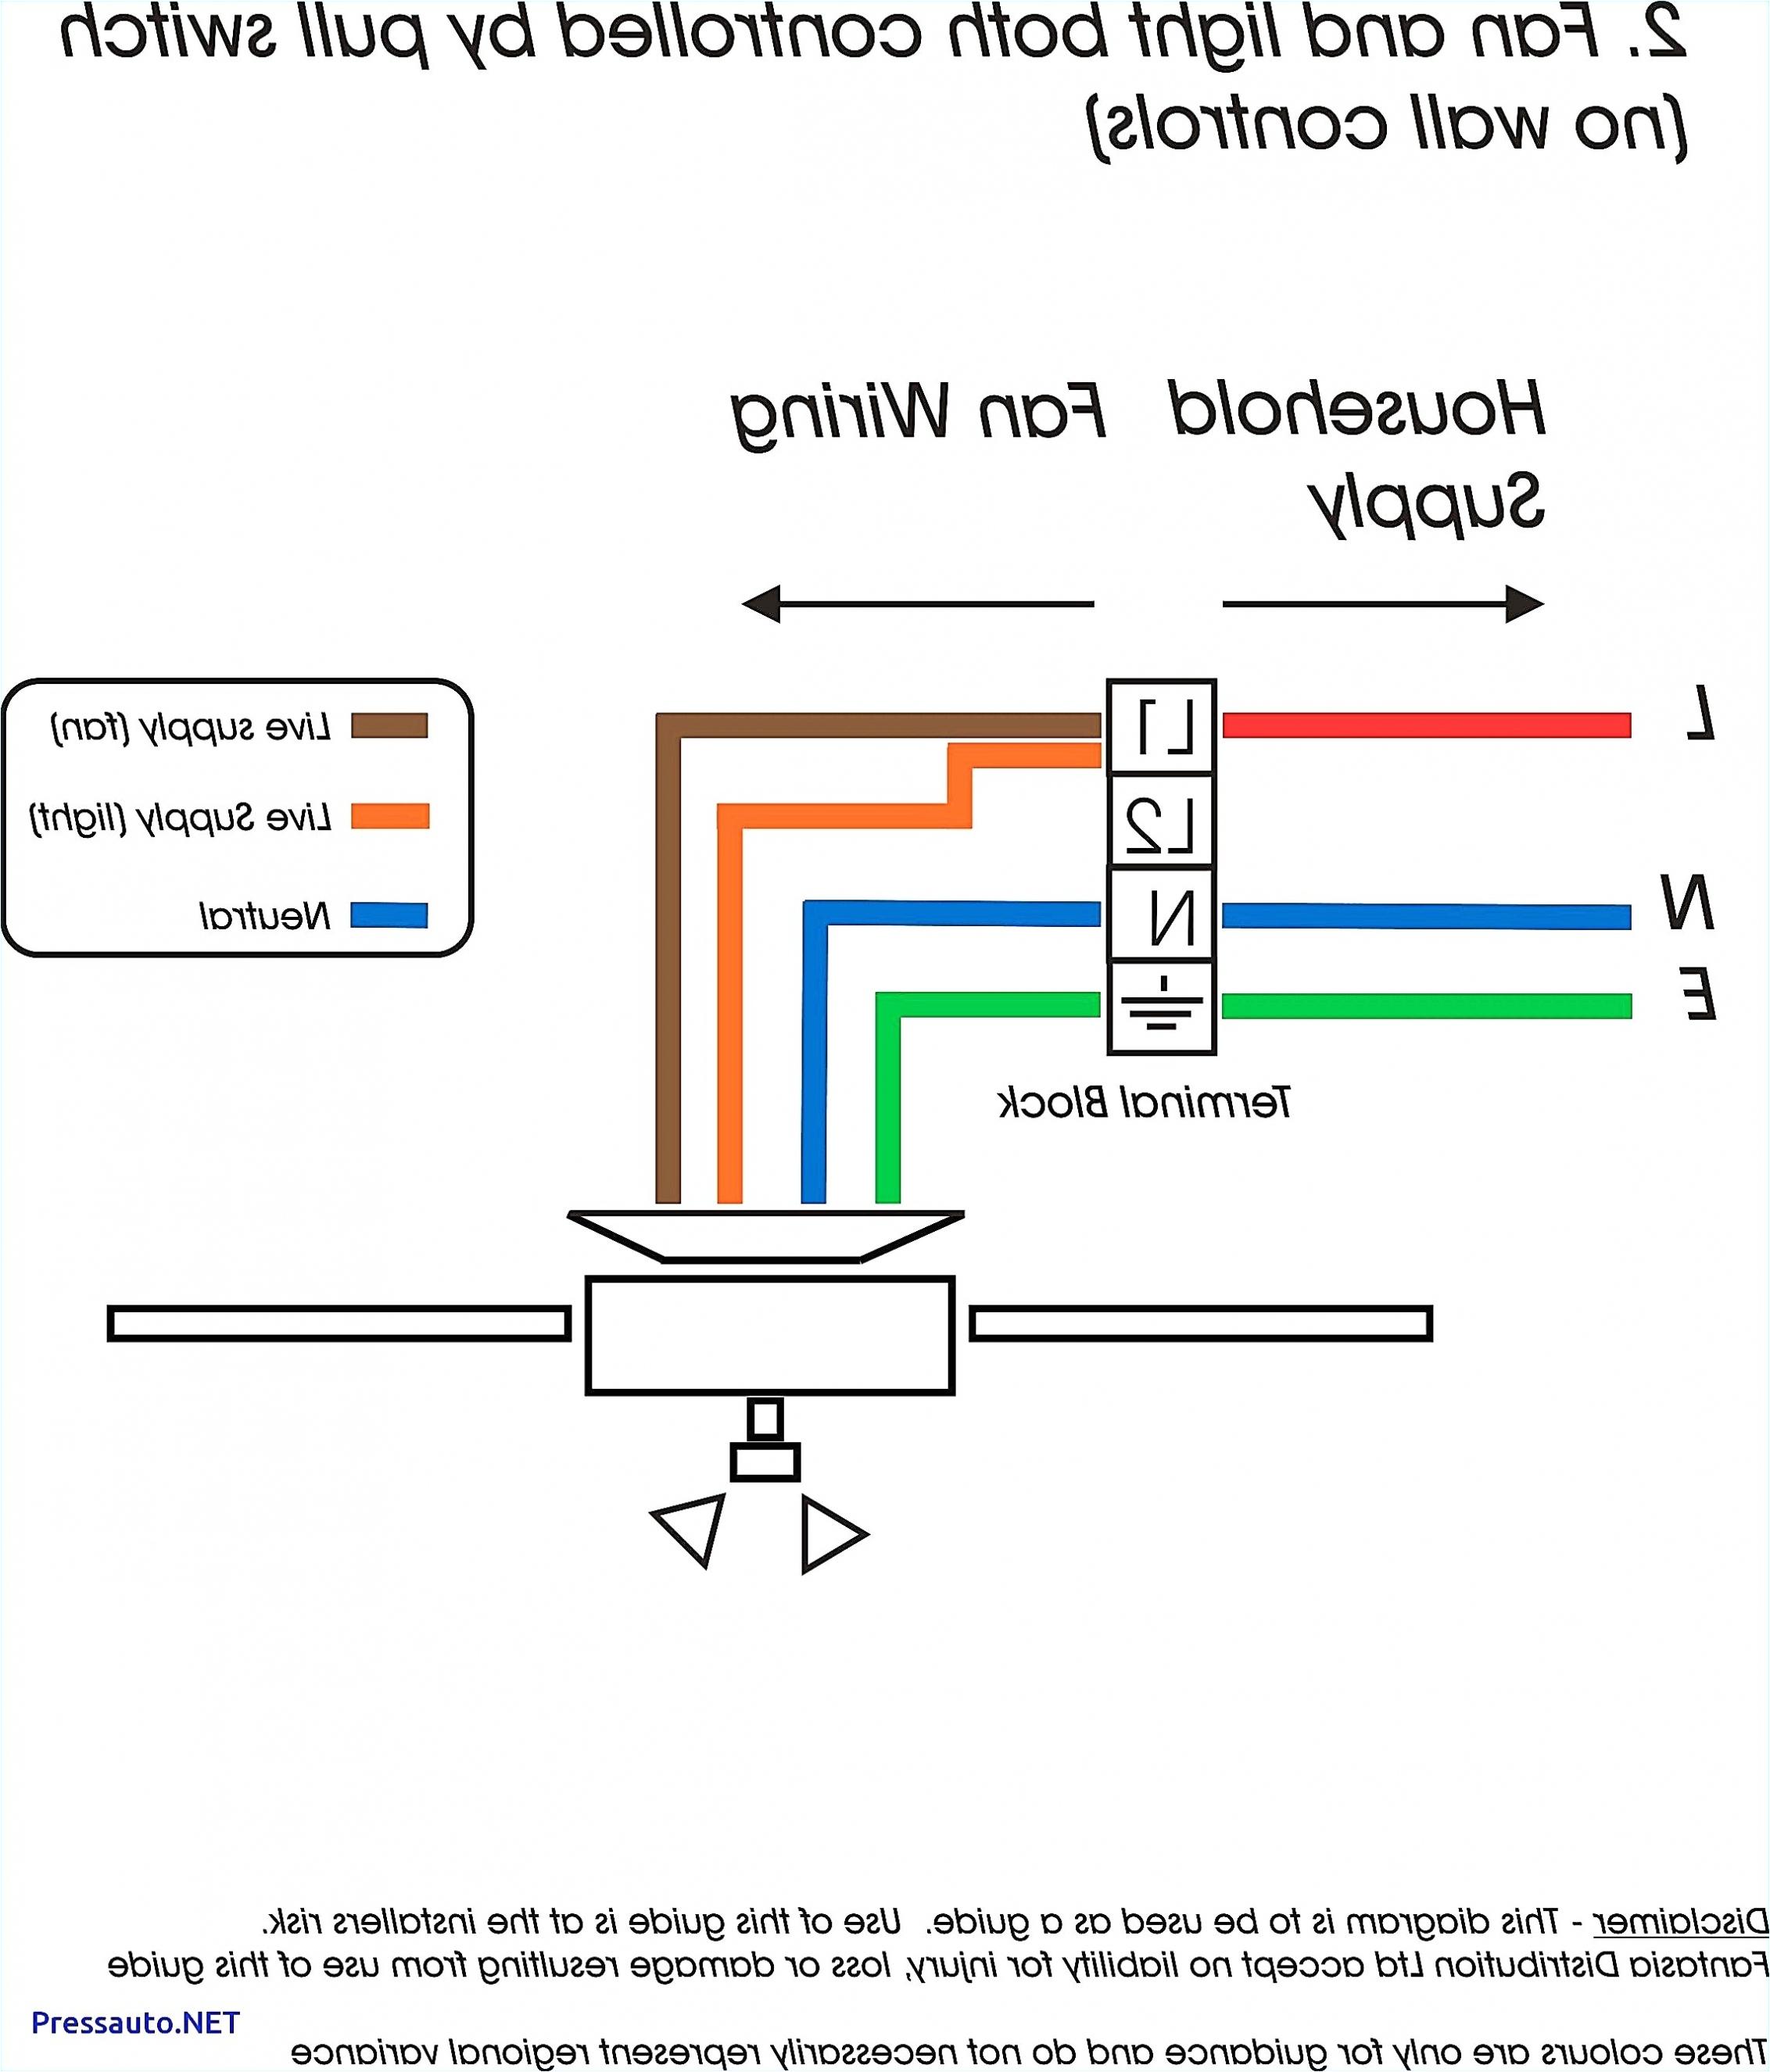 Marley Baseboard Heater Wiring Diagram 240v Baseboard Wiring Diagram Wiring Diagram